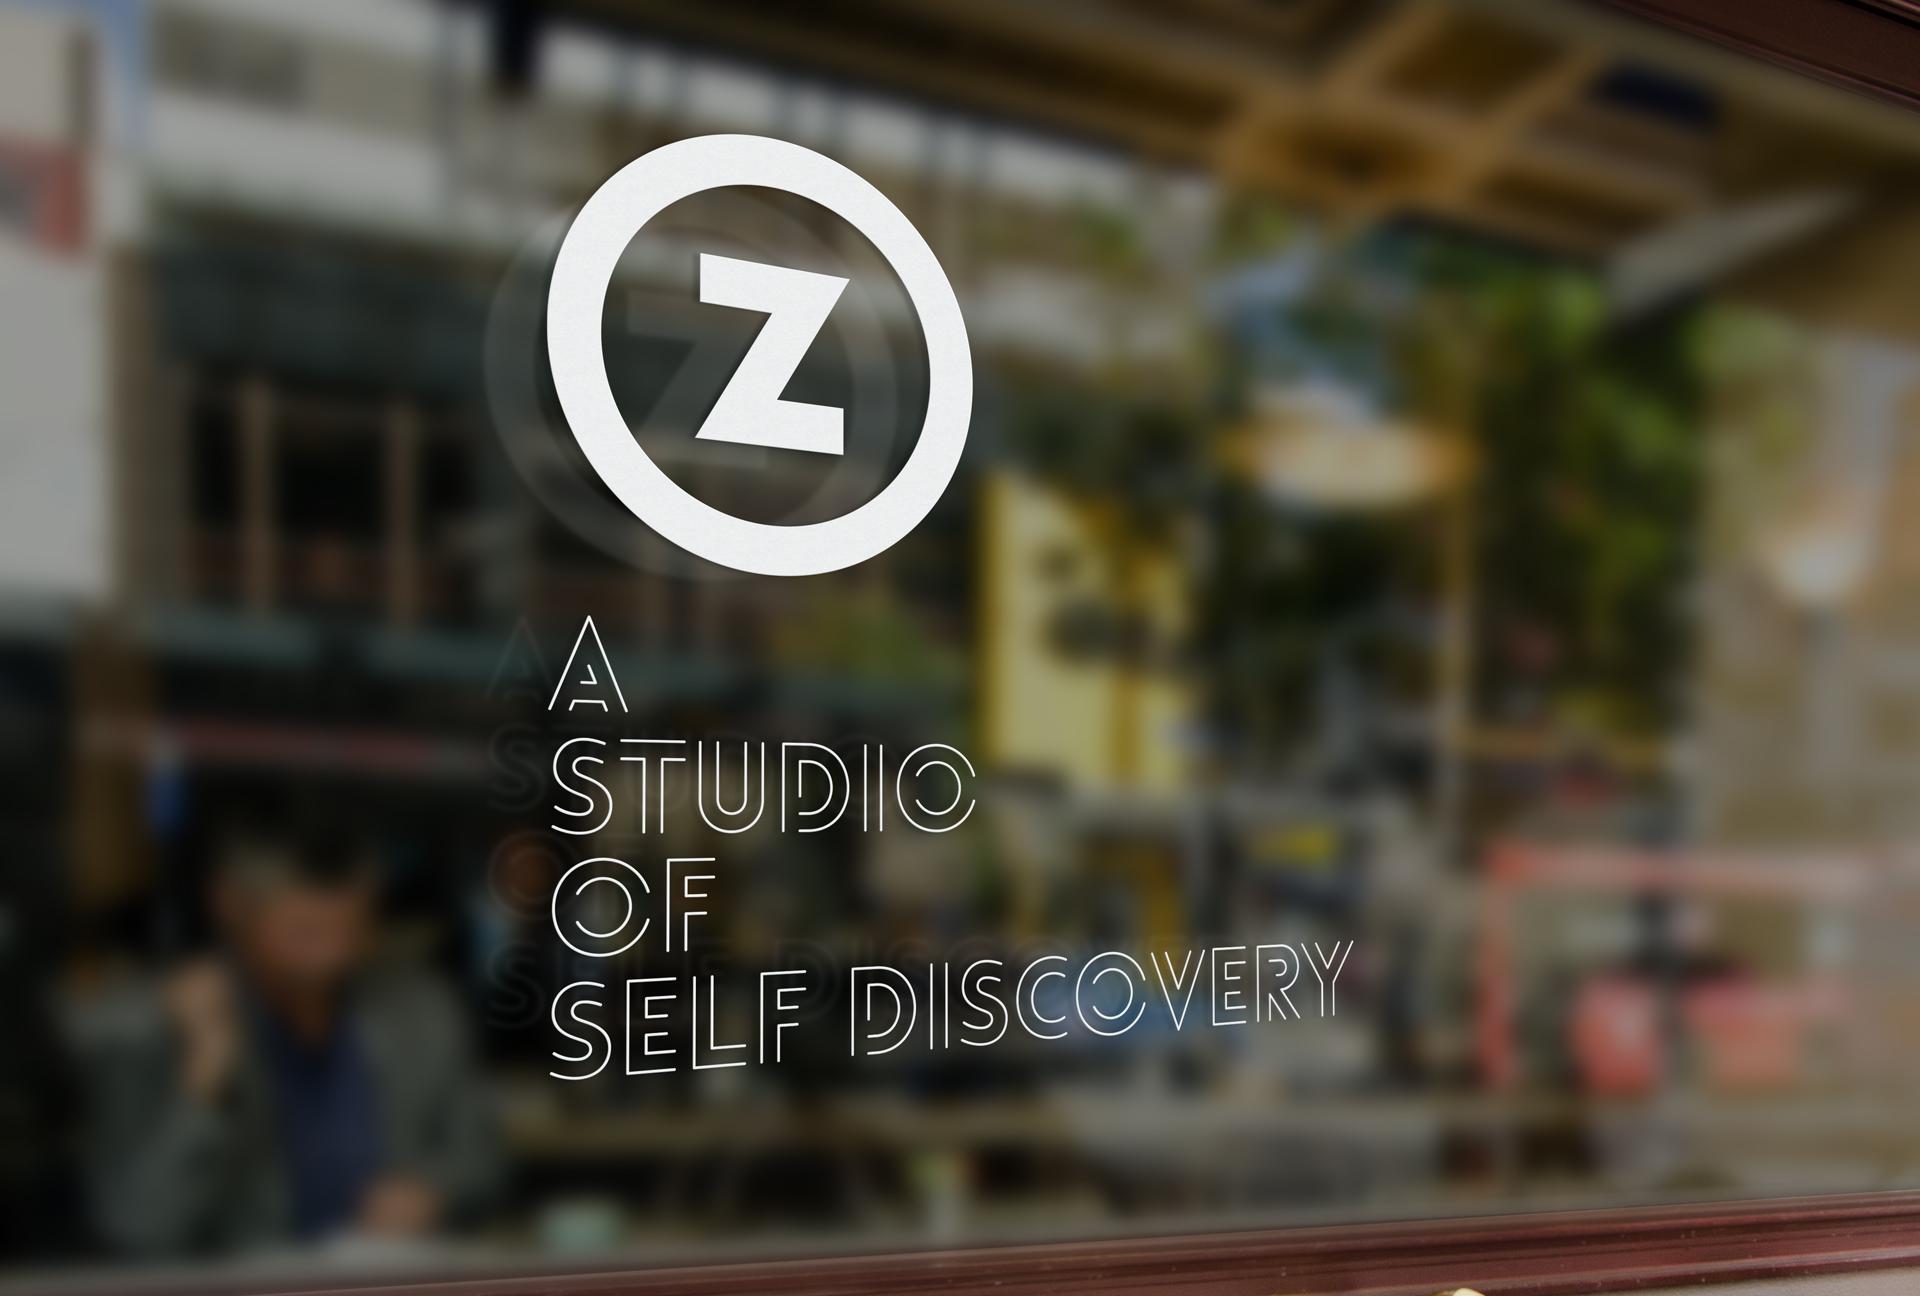 Zen-Window-Signage-2.jpg